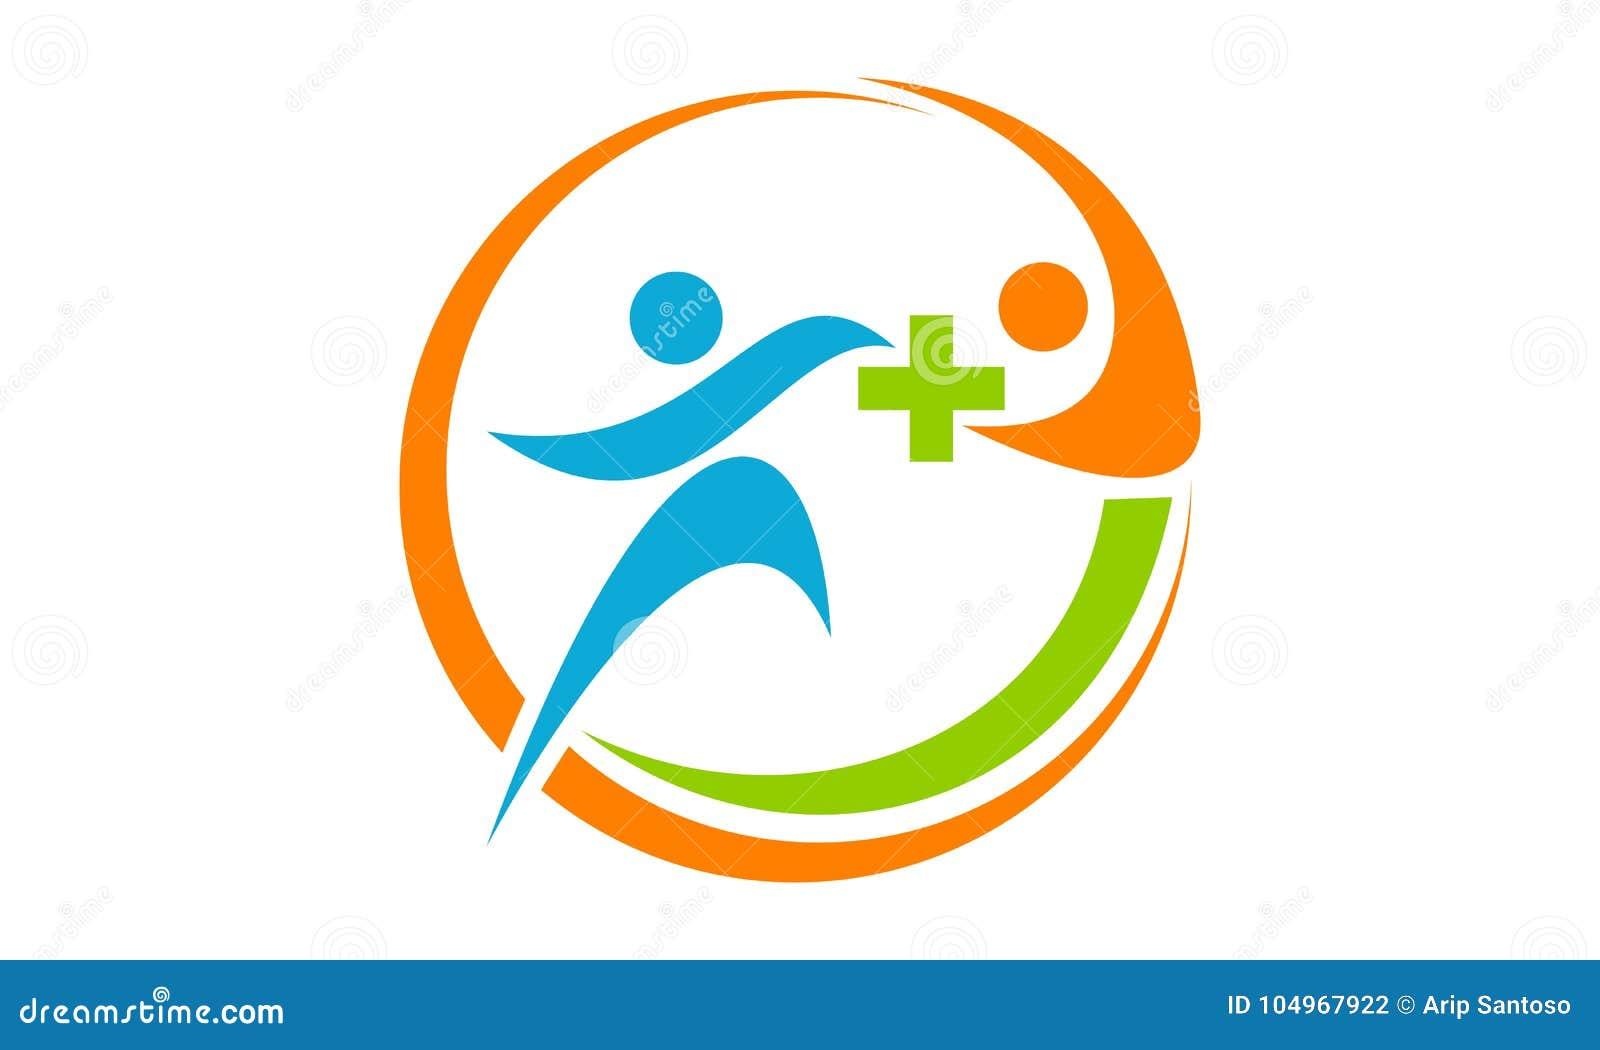 Health Solution Logo Design Template Stock Vector - Illustration of ...